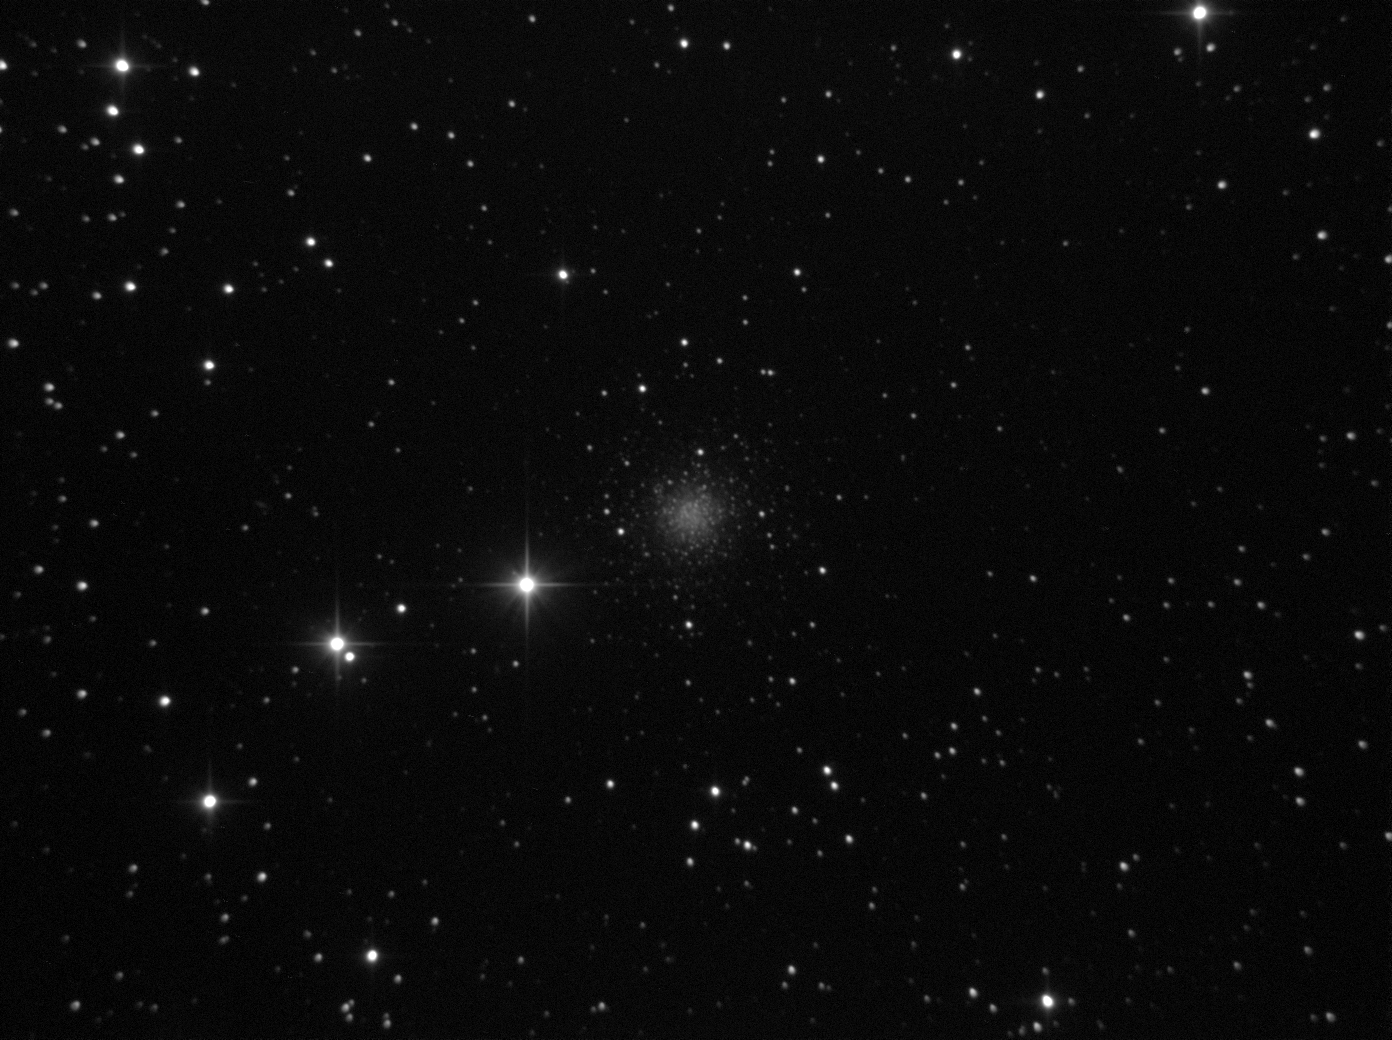 NGC2419 5x60s   B1   CLS   Intergalactic wanderer